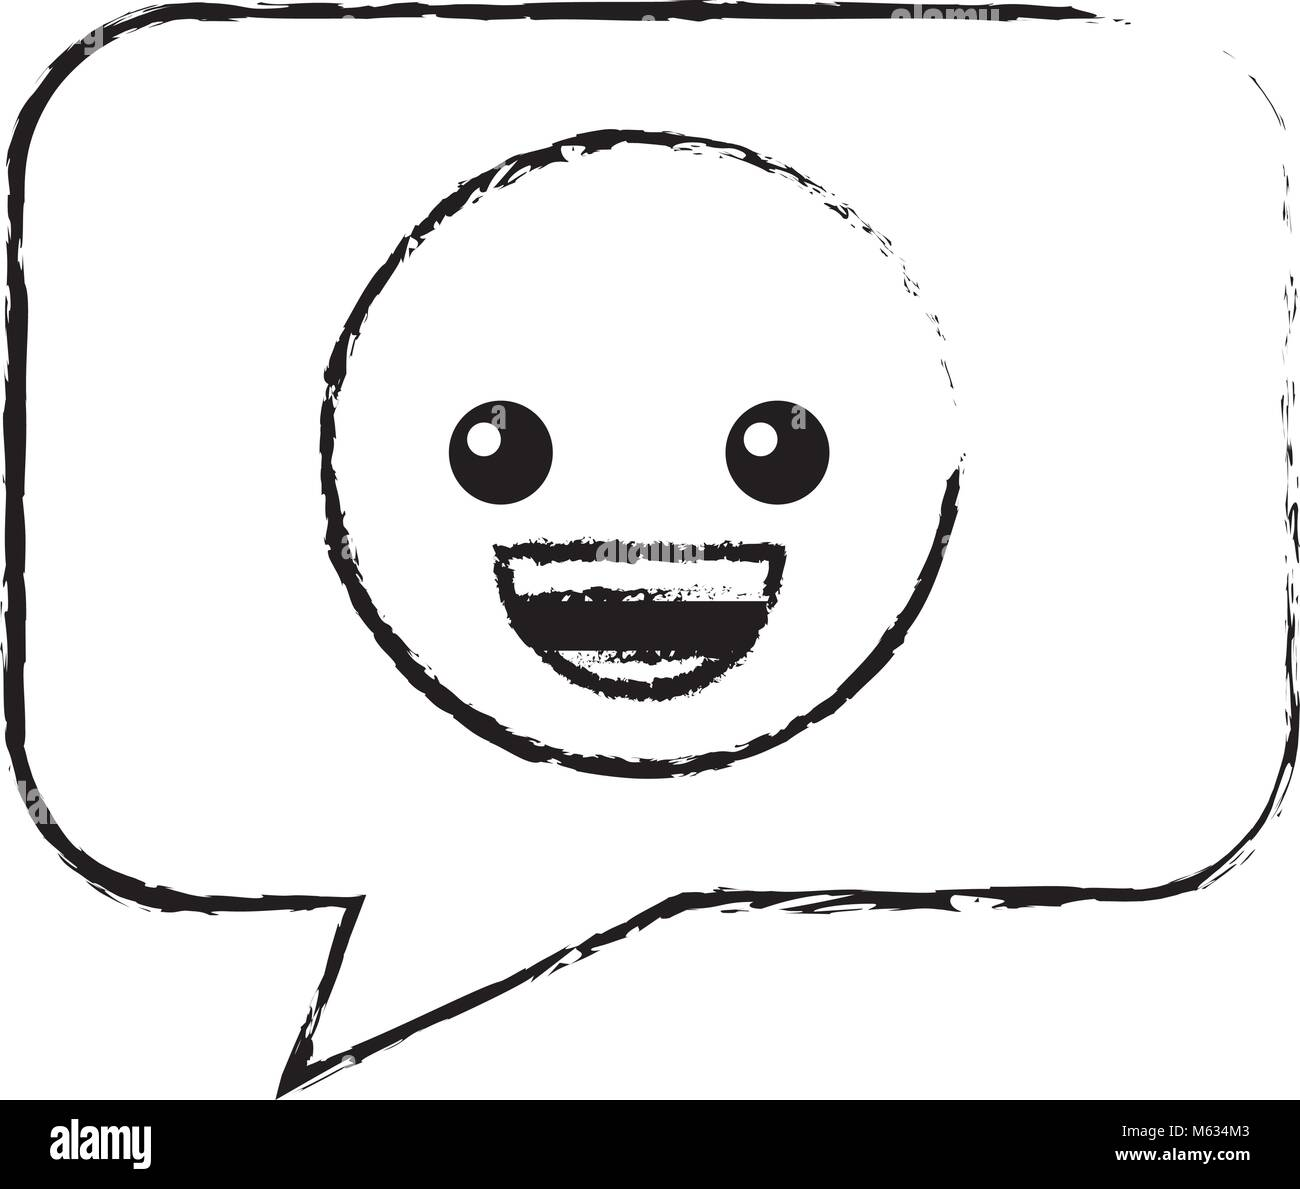 speech bubble with happy emoji Stock Vector Art & Illustration